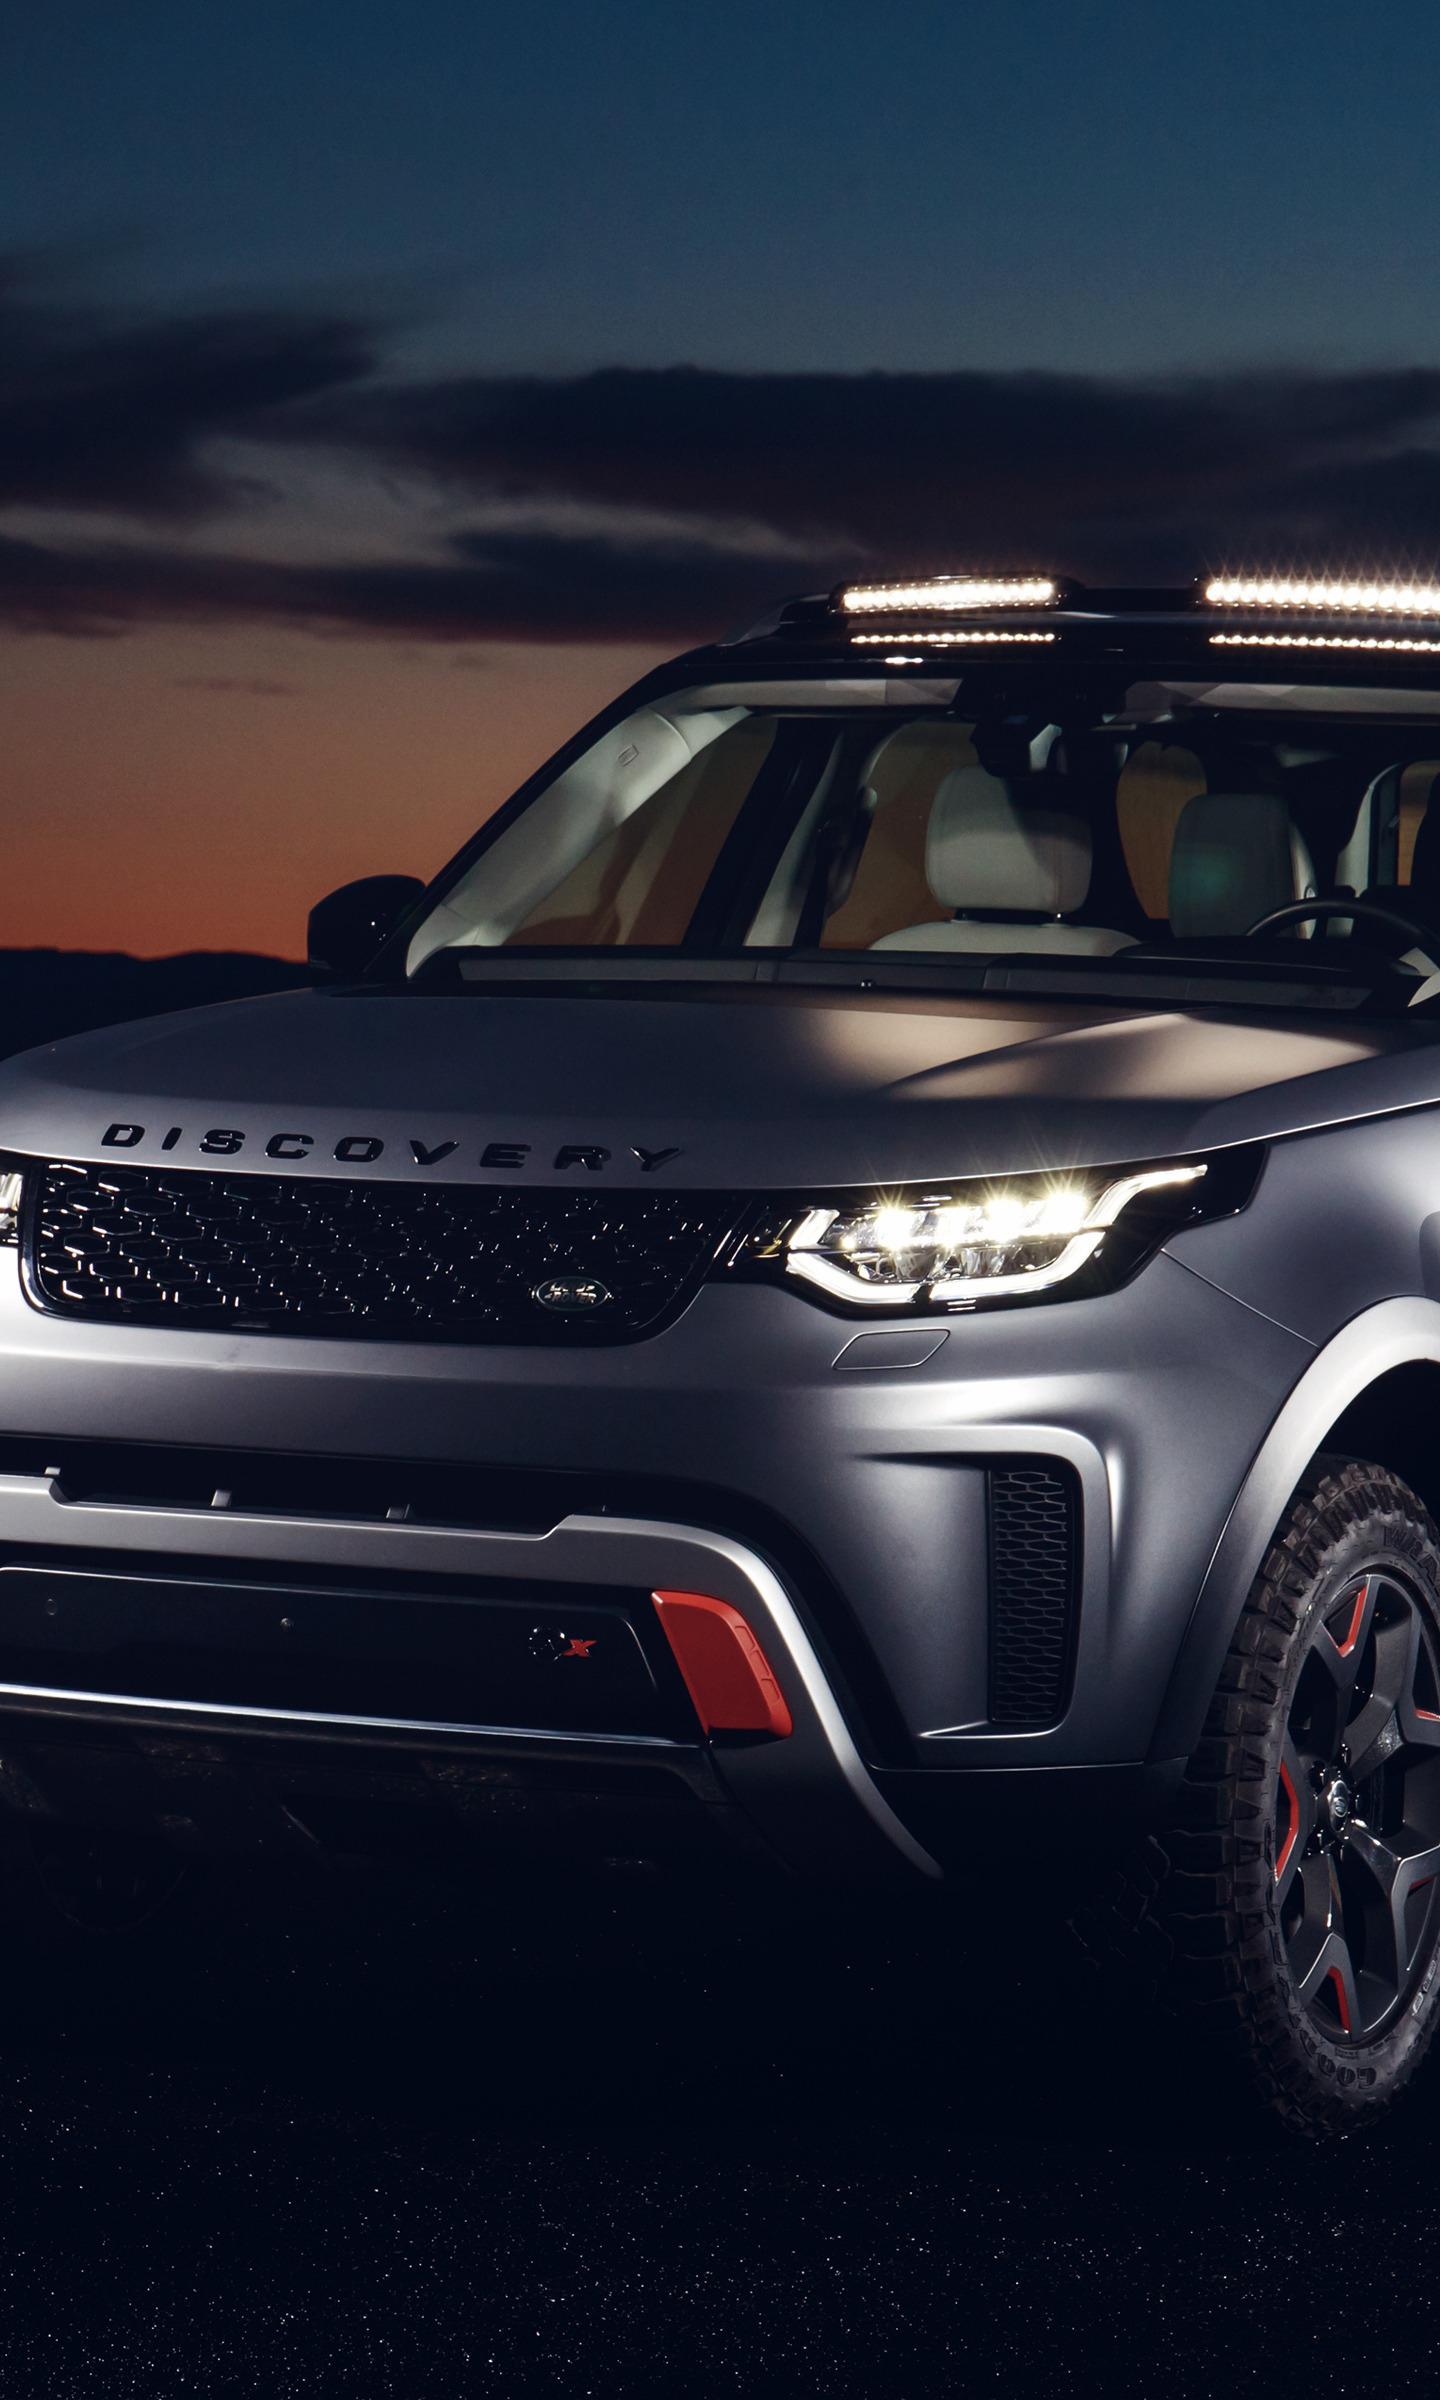 2018 Land Rover Discovery Svx, Suv Car, 1440X2960 Wallpaper